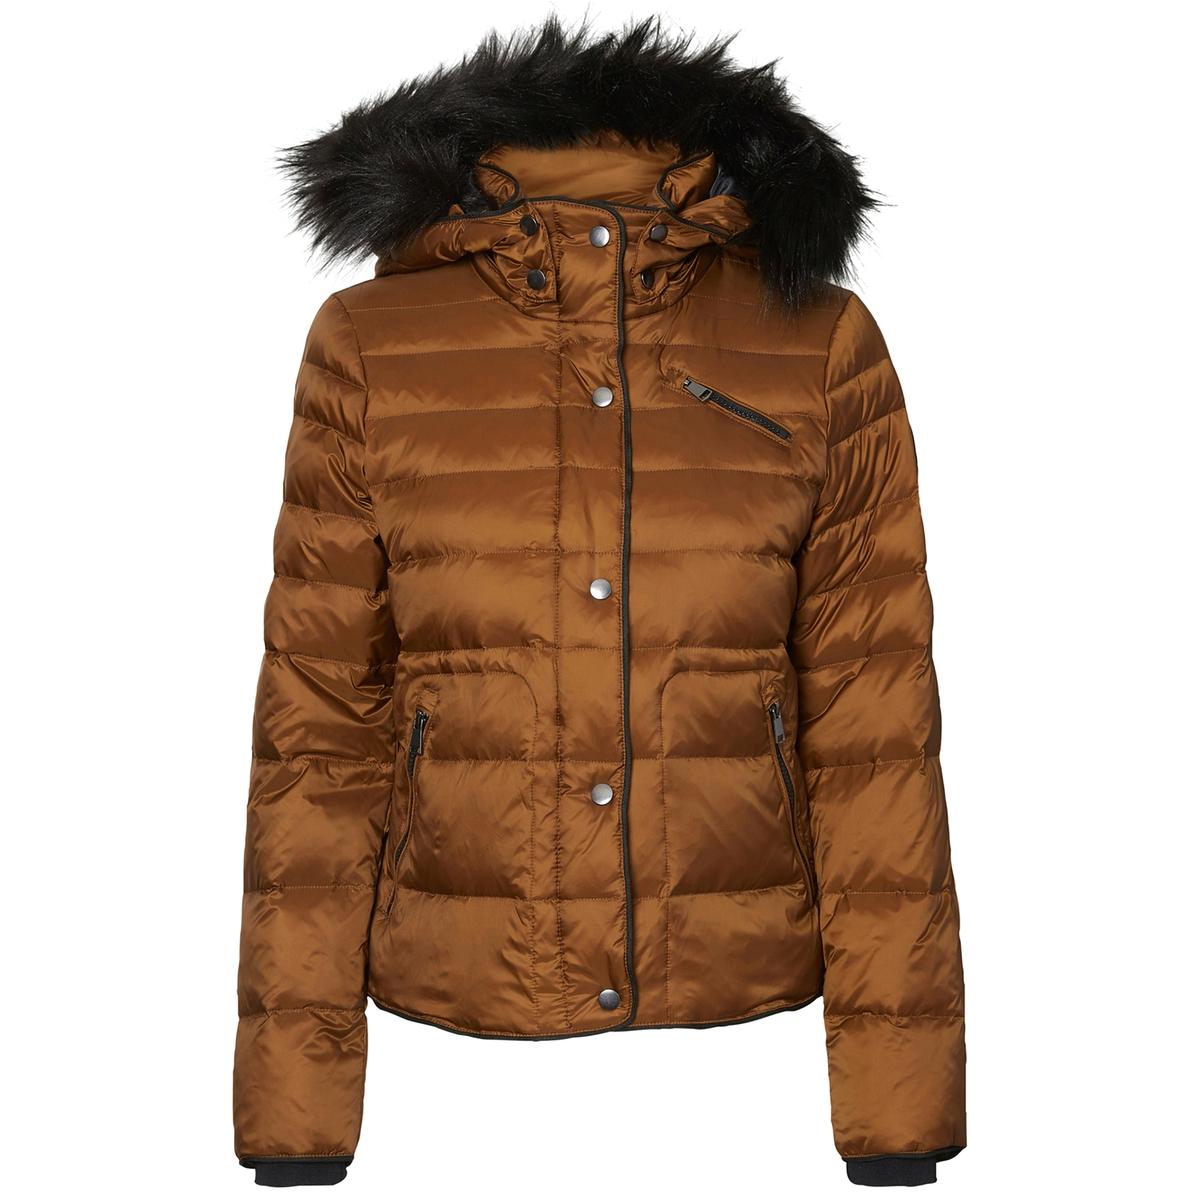 Куртка стеганая короткая с капюшоном куртка стеганая короткая двусторонняя